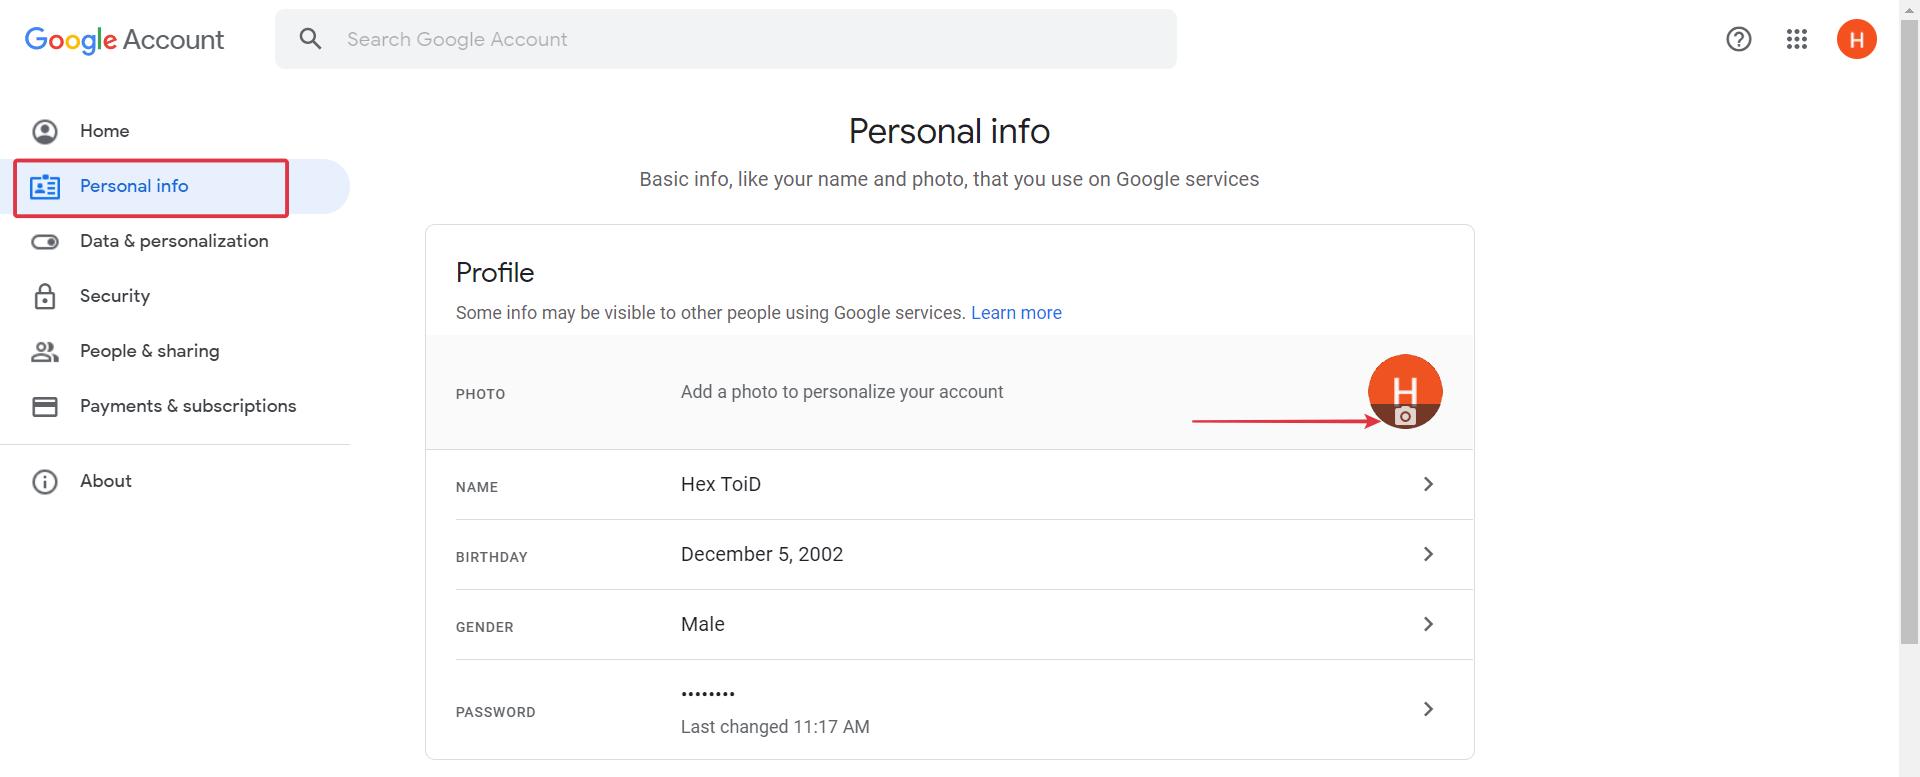 Go to Personal info tab > Click camera Icon